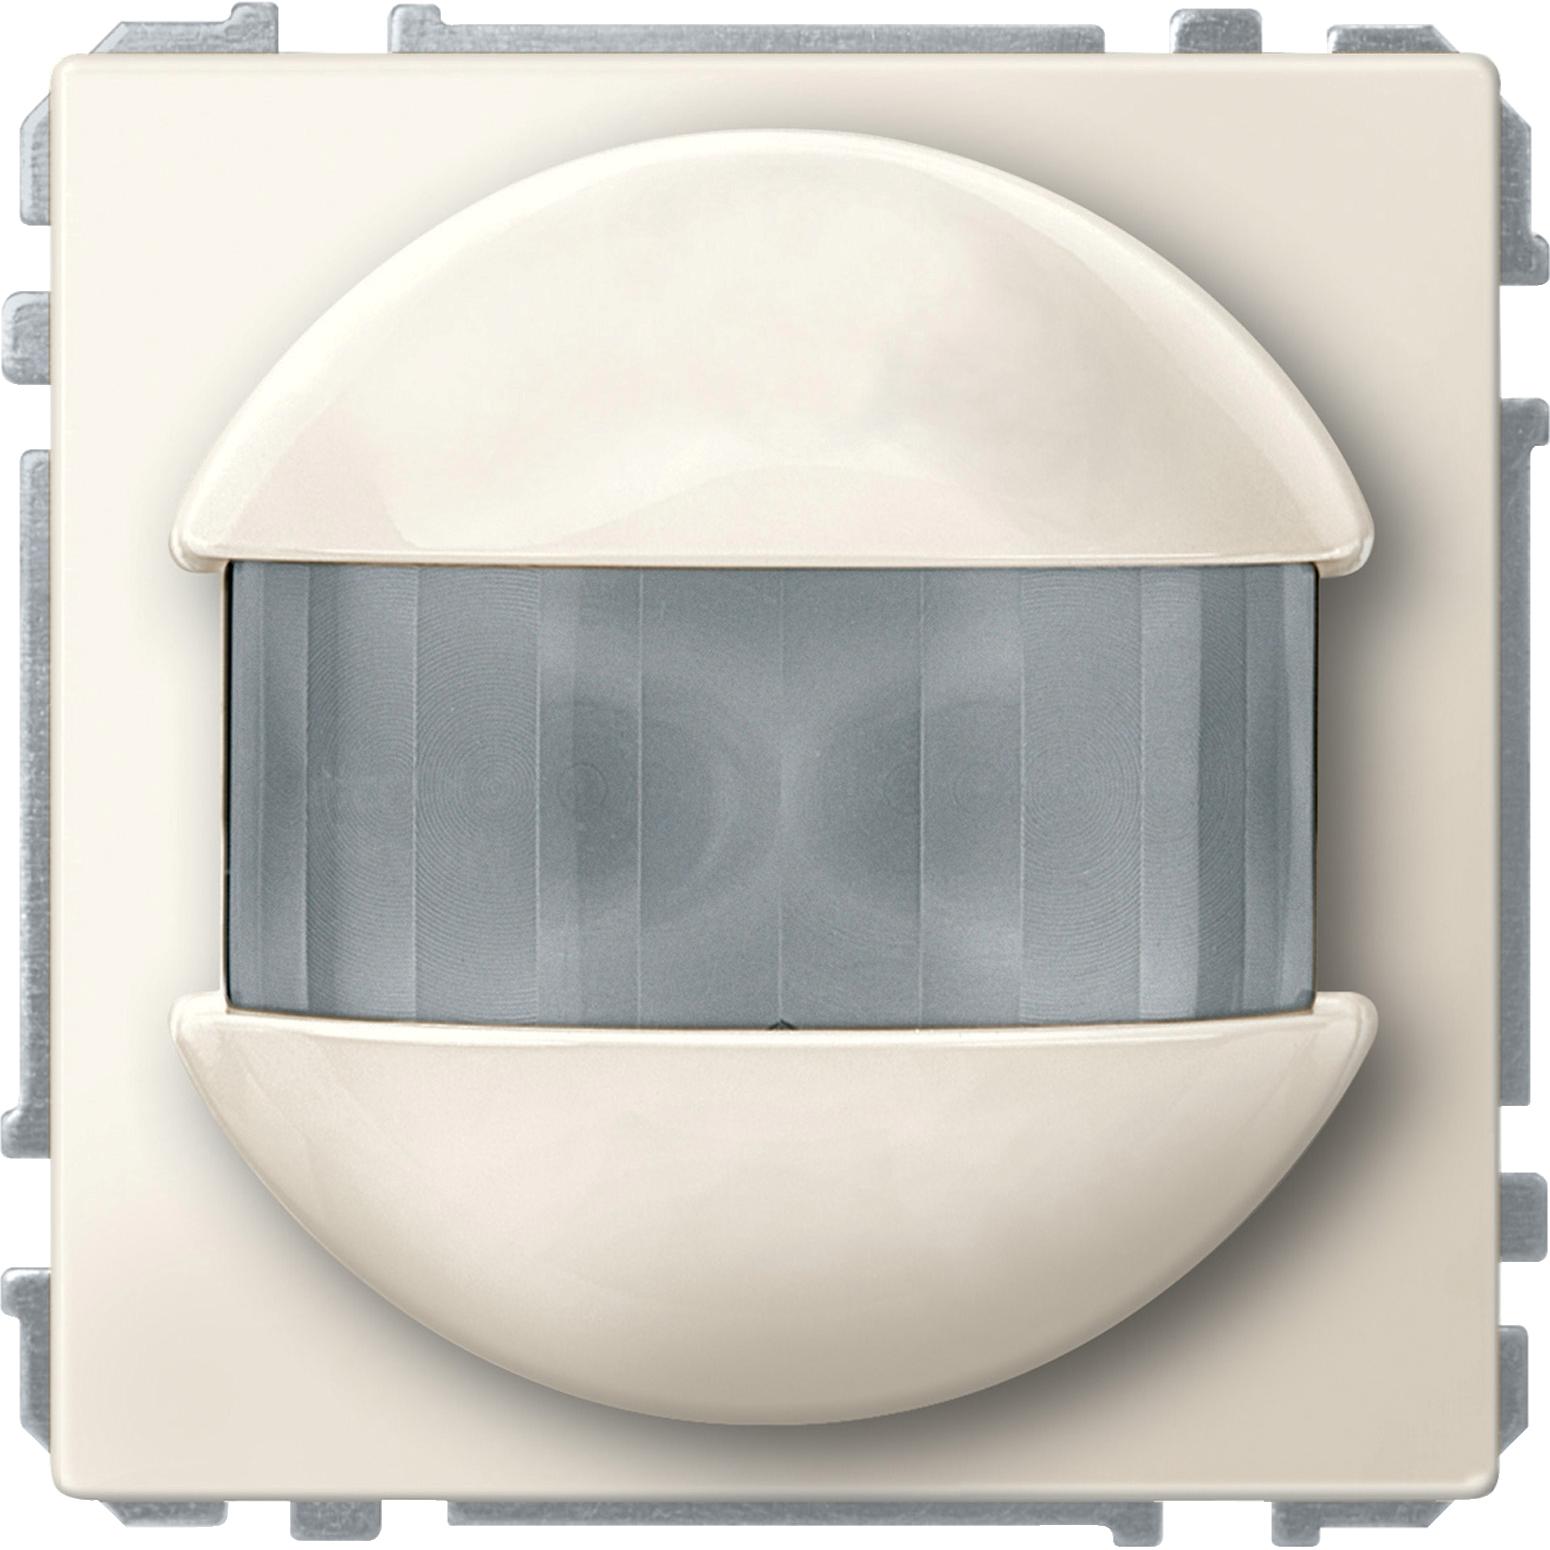 Image Description for https://tedi.itc-electronics.com/itcmedia/images/20190426/MTN631844_SCHNEIDERELECTRIC_1.jpeg